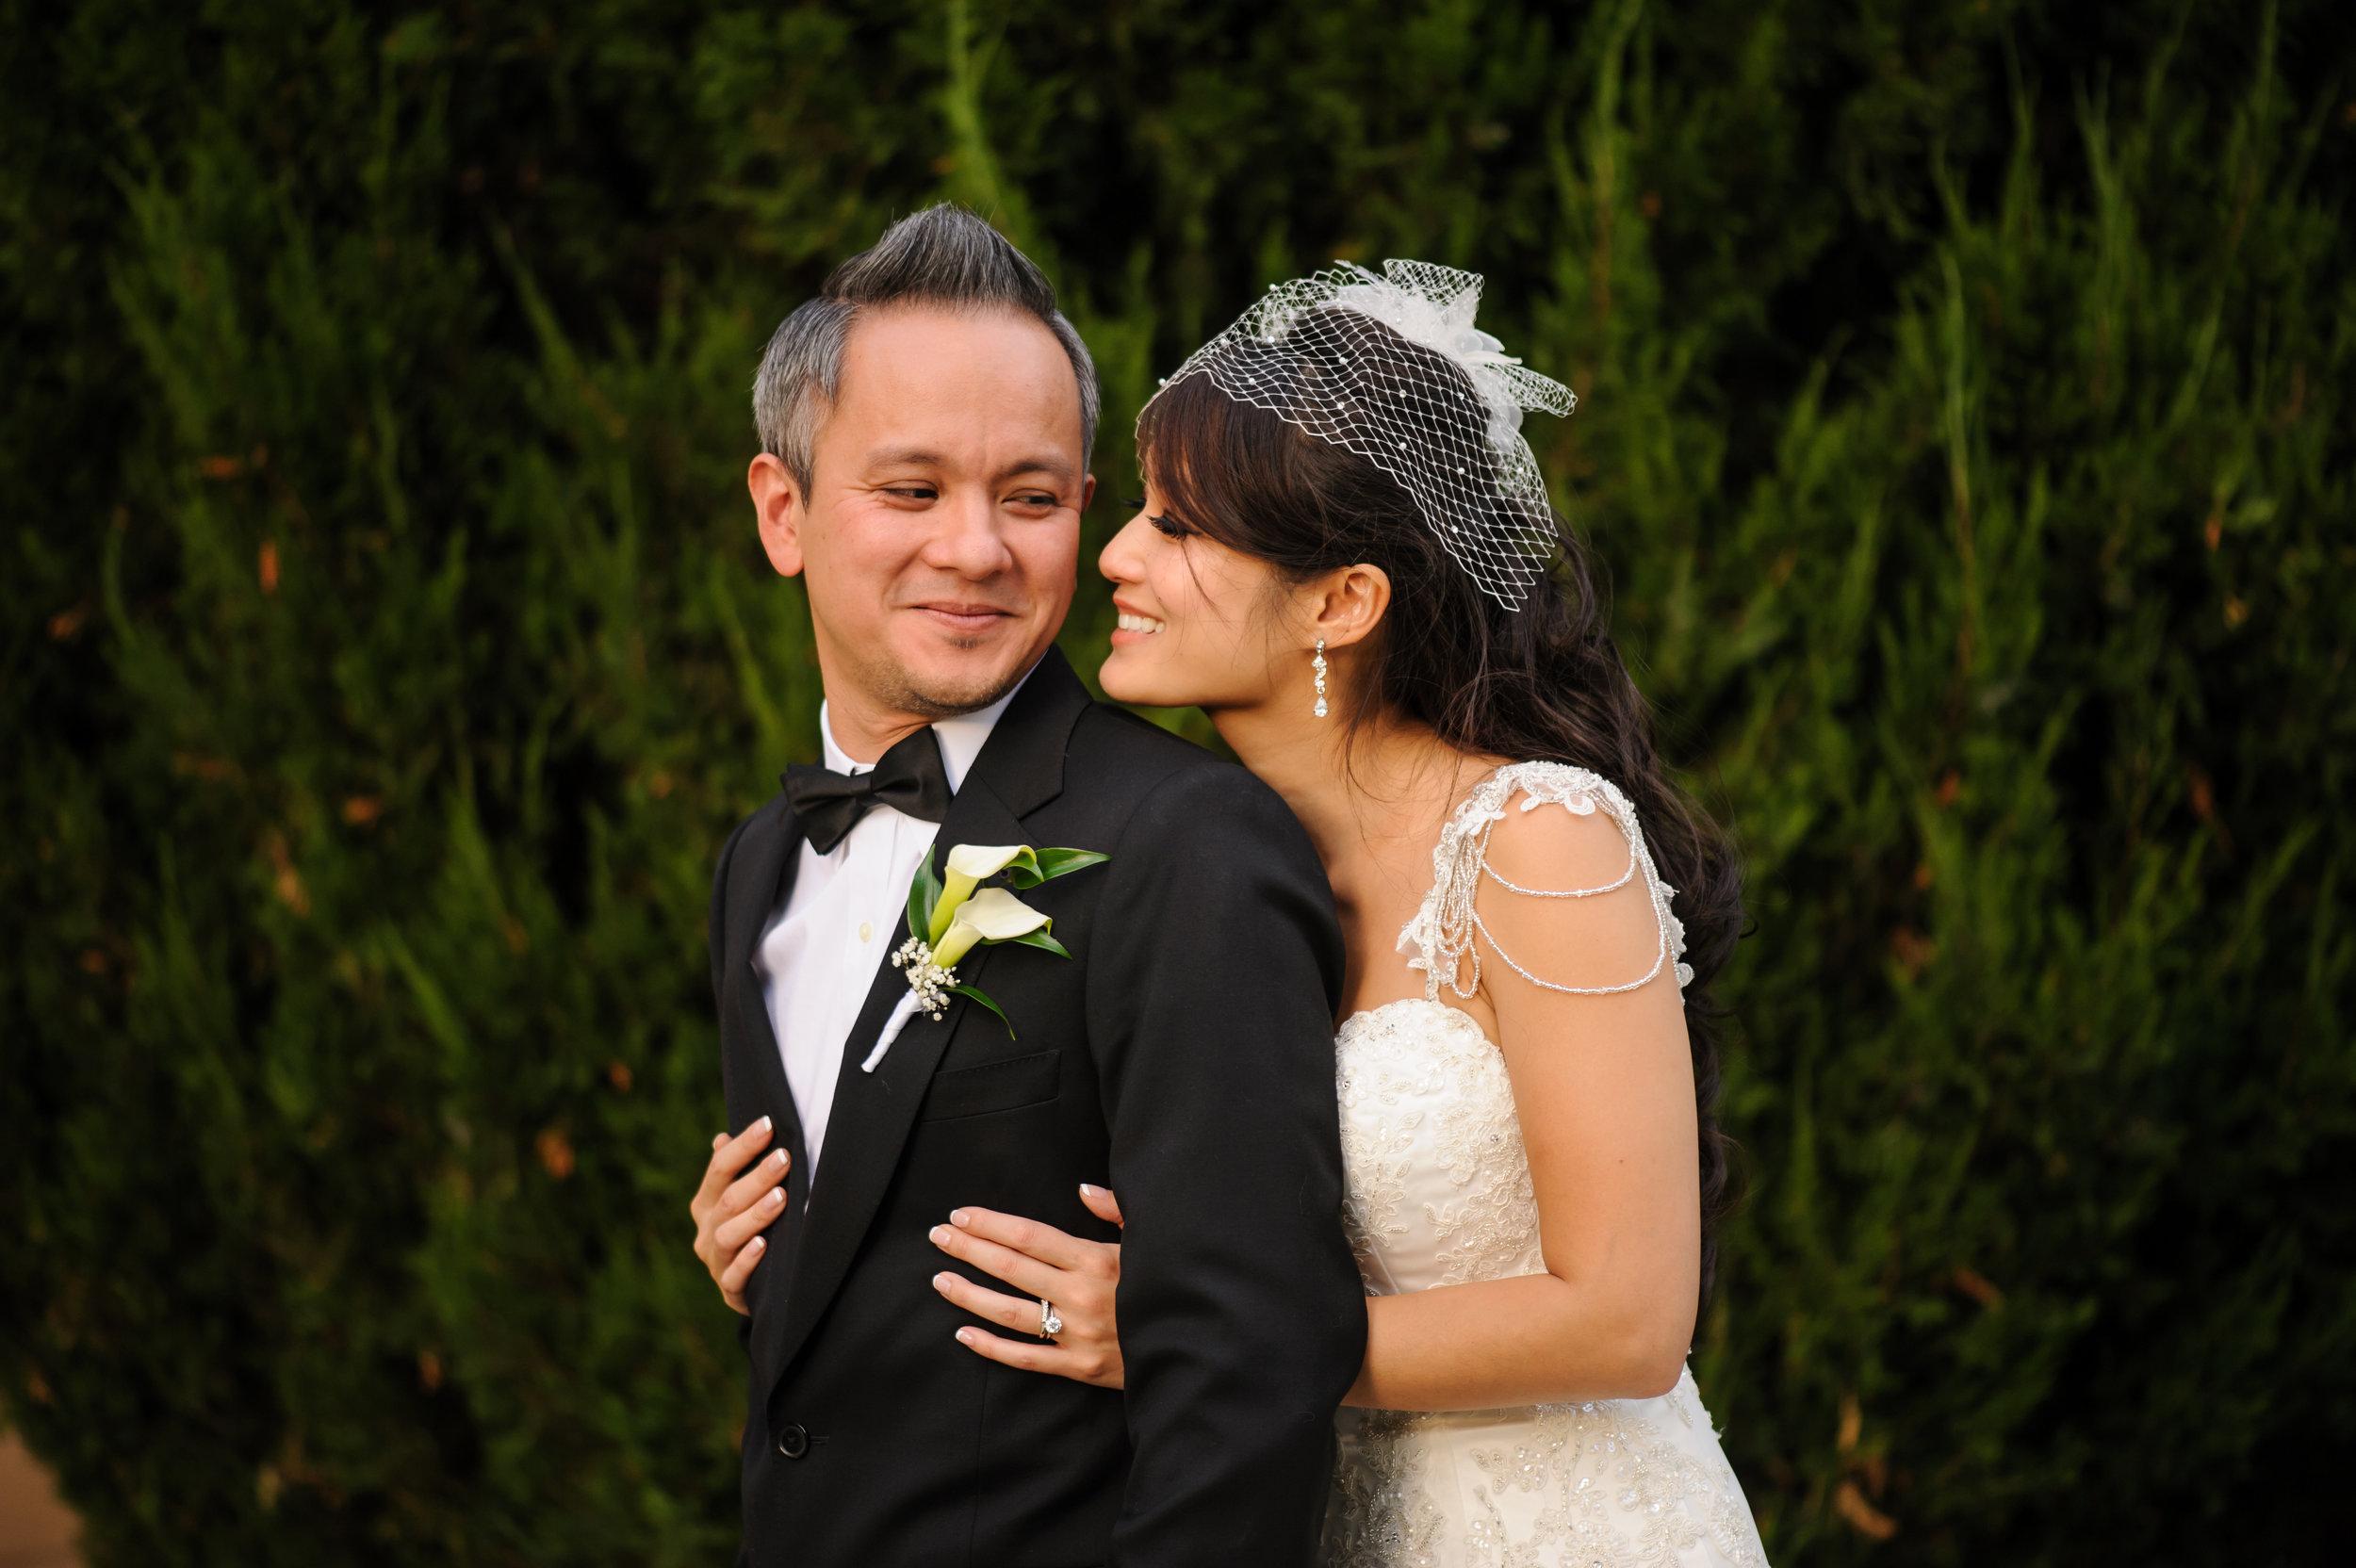 camilla-thuy-072-memorial-auditorium-sacramento-wedding-photographer-katherine-nicole-photography.JPG